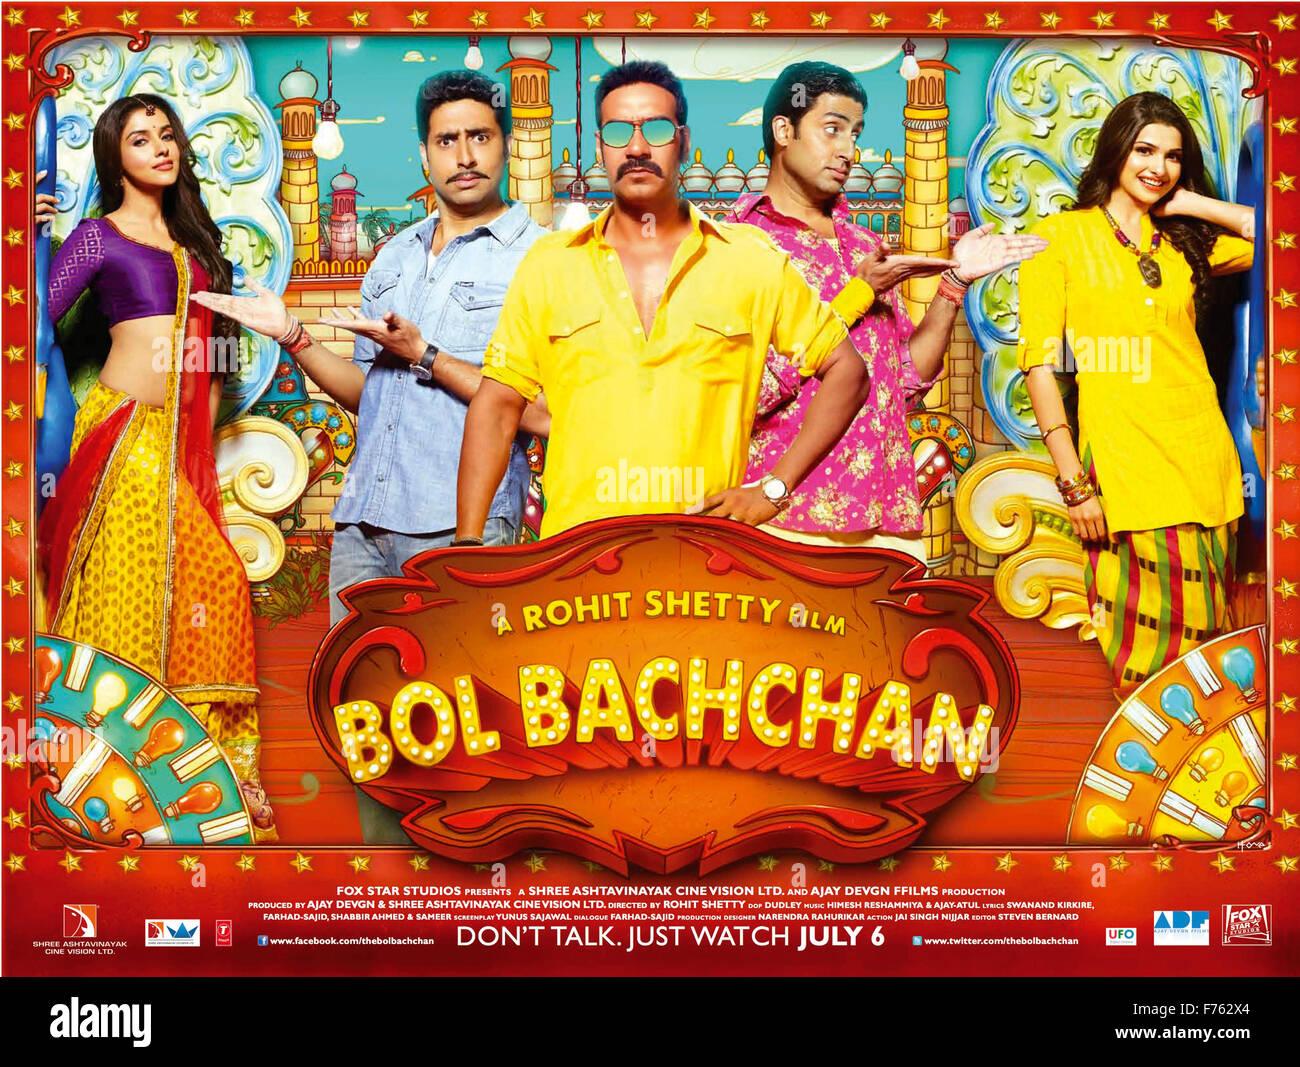 Hindi bollywood indien affiche de film film de bol bachchan l'Inde Photo Stock